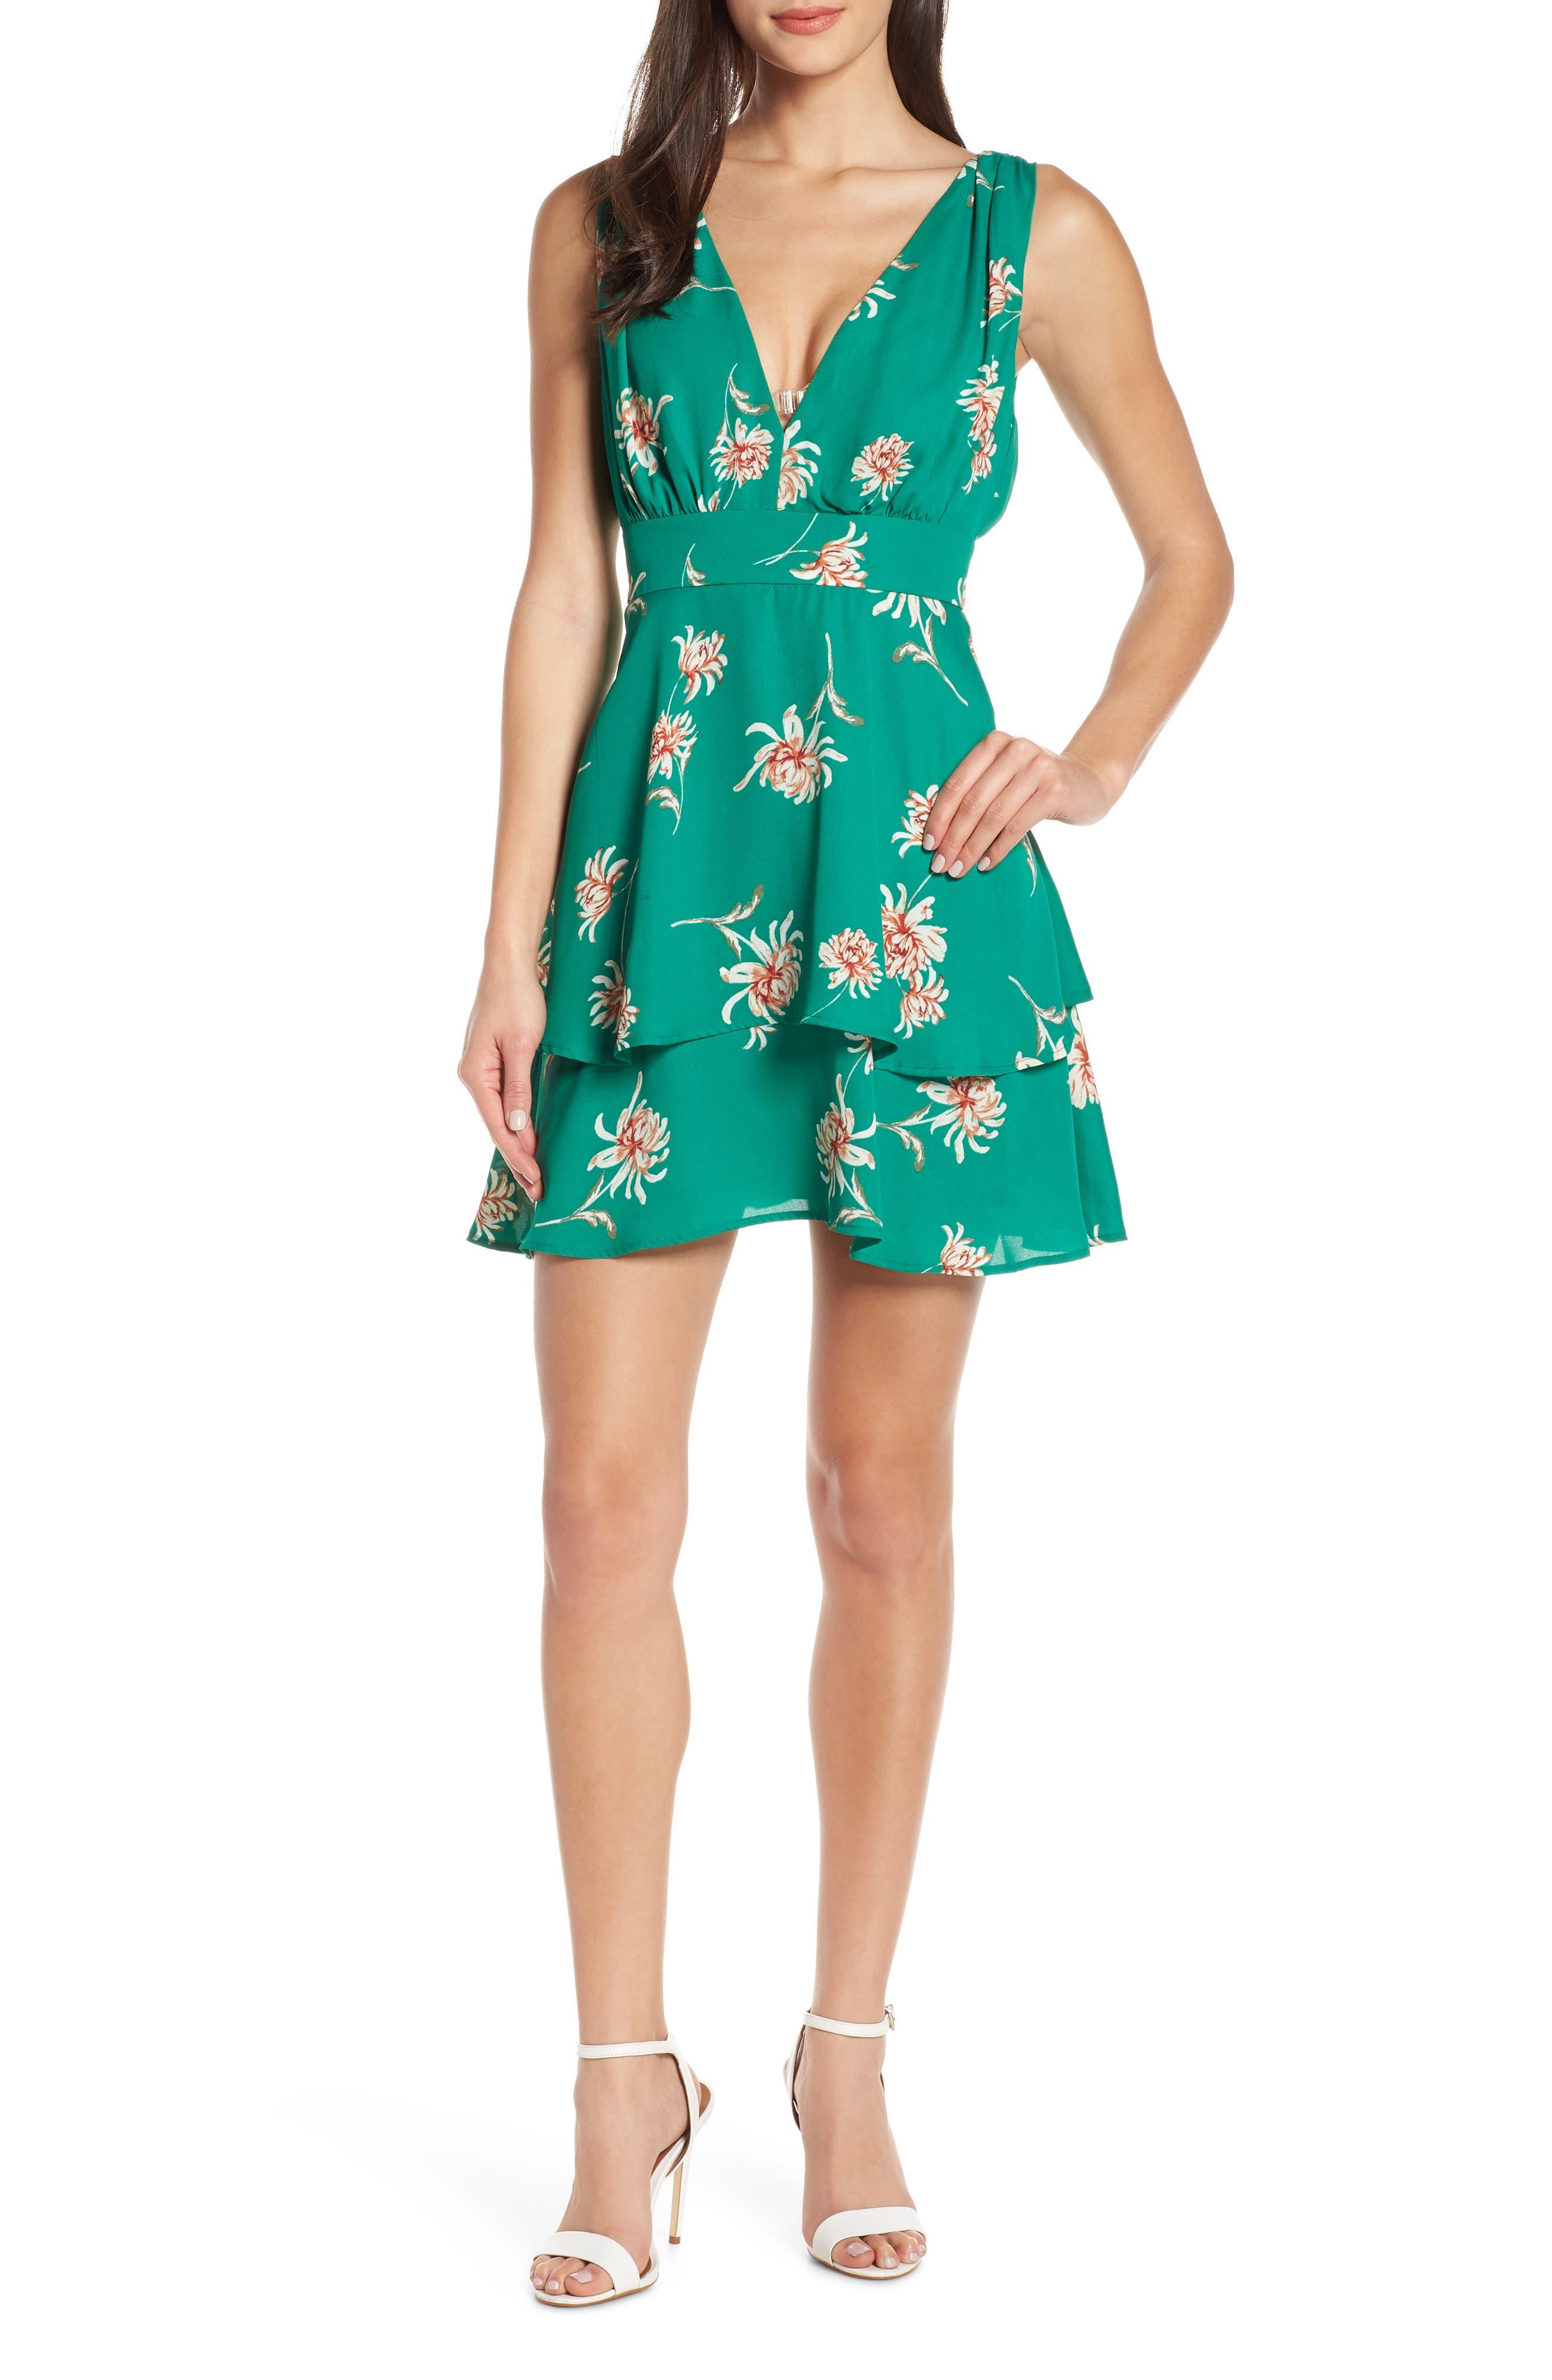 BB DAKOTA Garden Strolls Blossom Party Minidress, Main, color, PEPPER GREEN